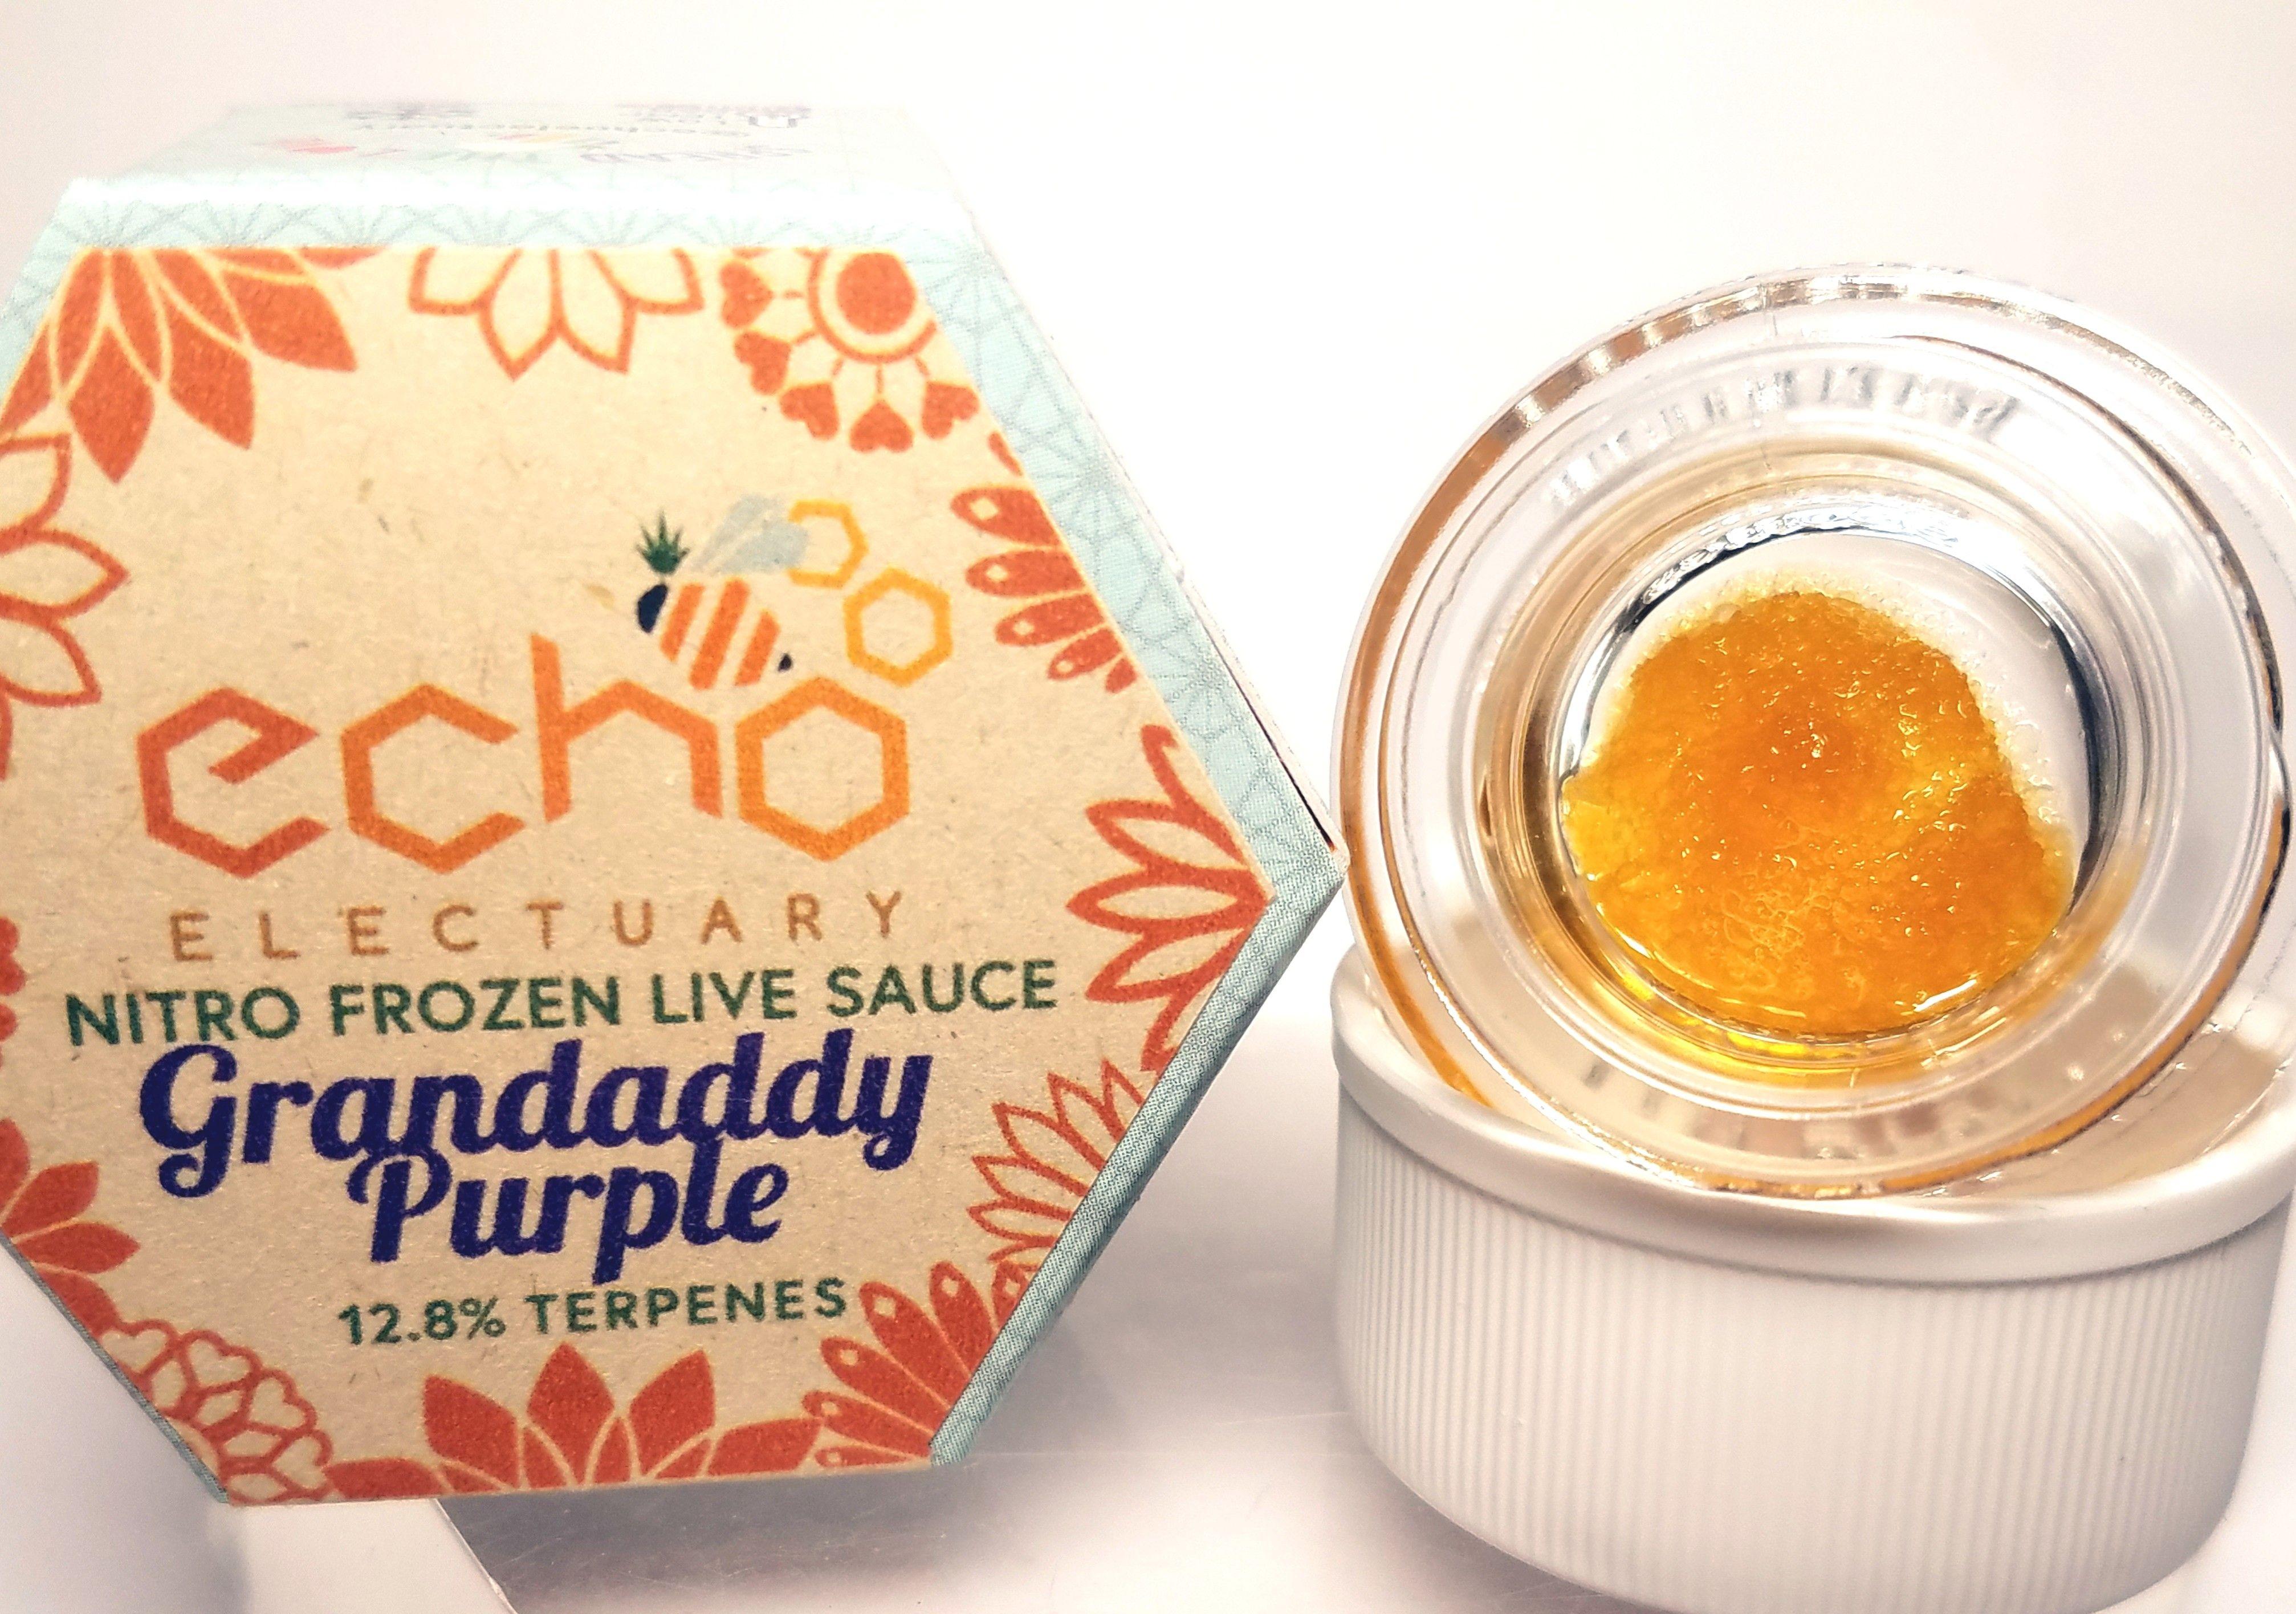 Echo Electuary - Granddaddy Purple, Indica Hybrid, Nitro Frozen Live Resin